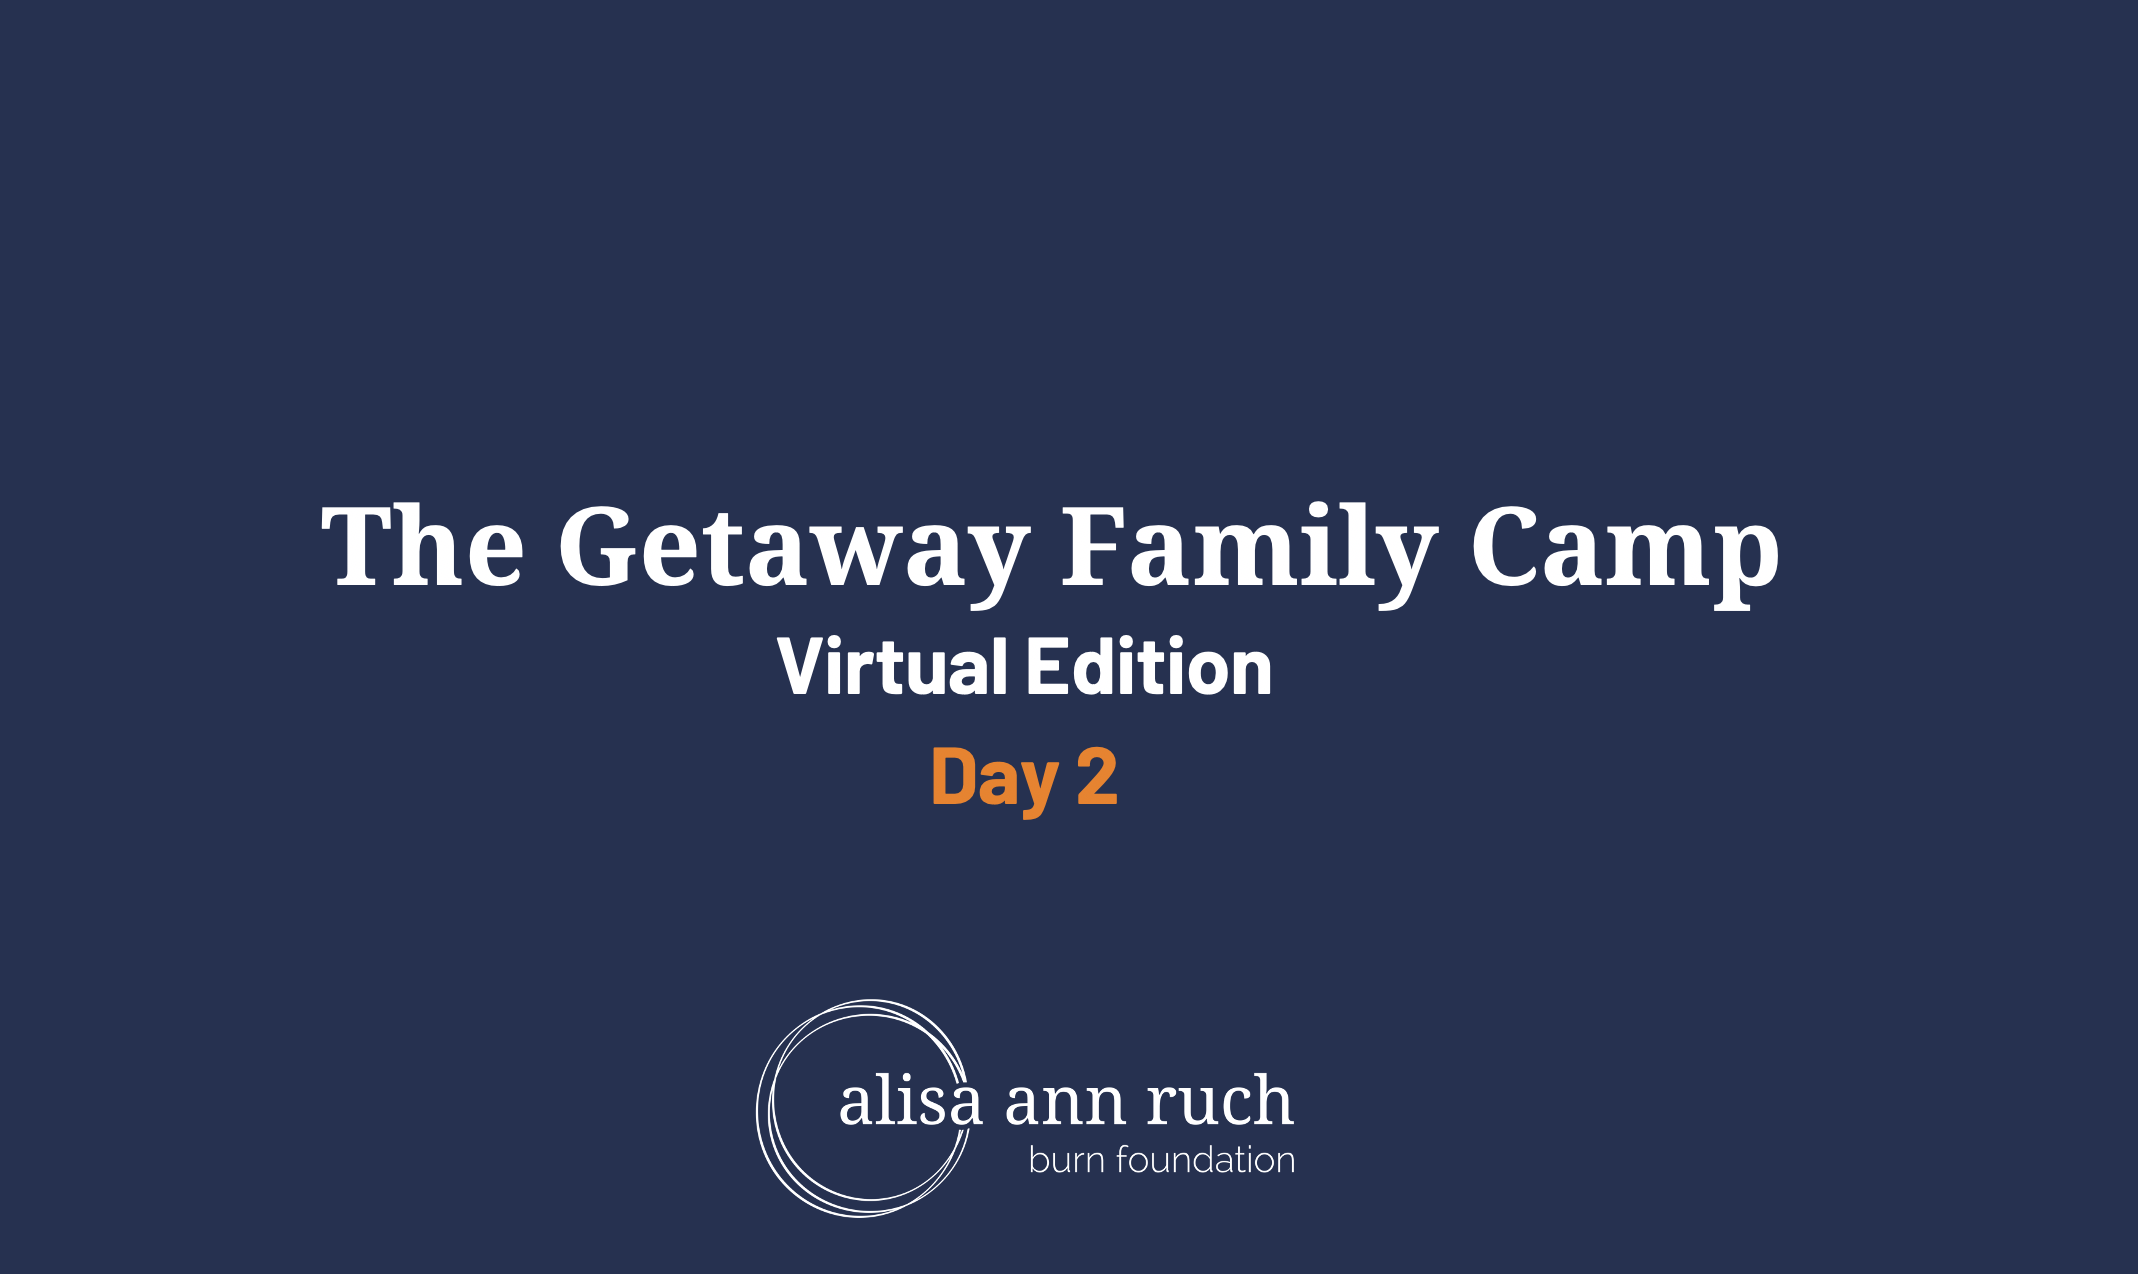 Day 2 – Virtual Getaway Family Camp